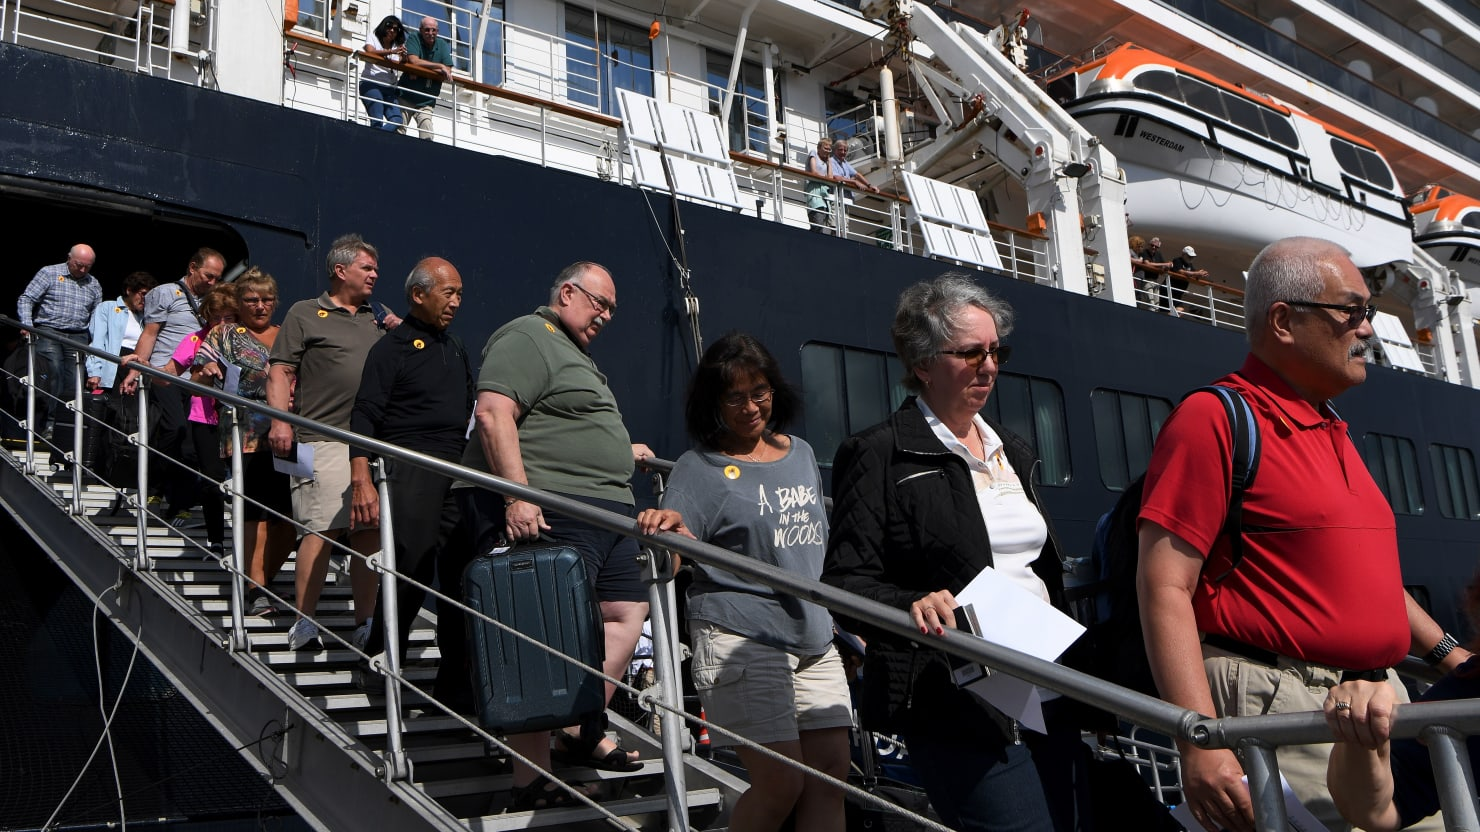 MS Westerdam Passengers Coronavirus Diagnosis Raises New Fears